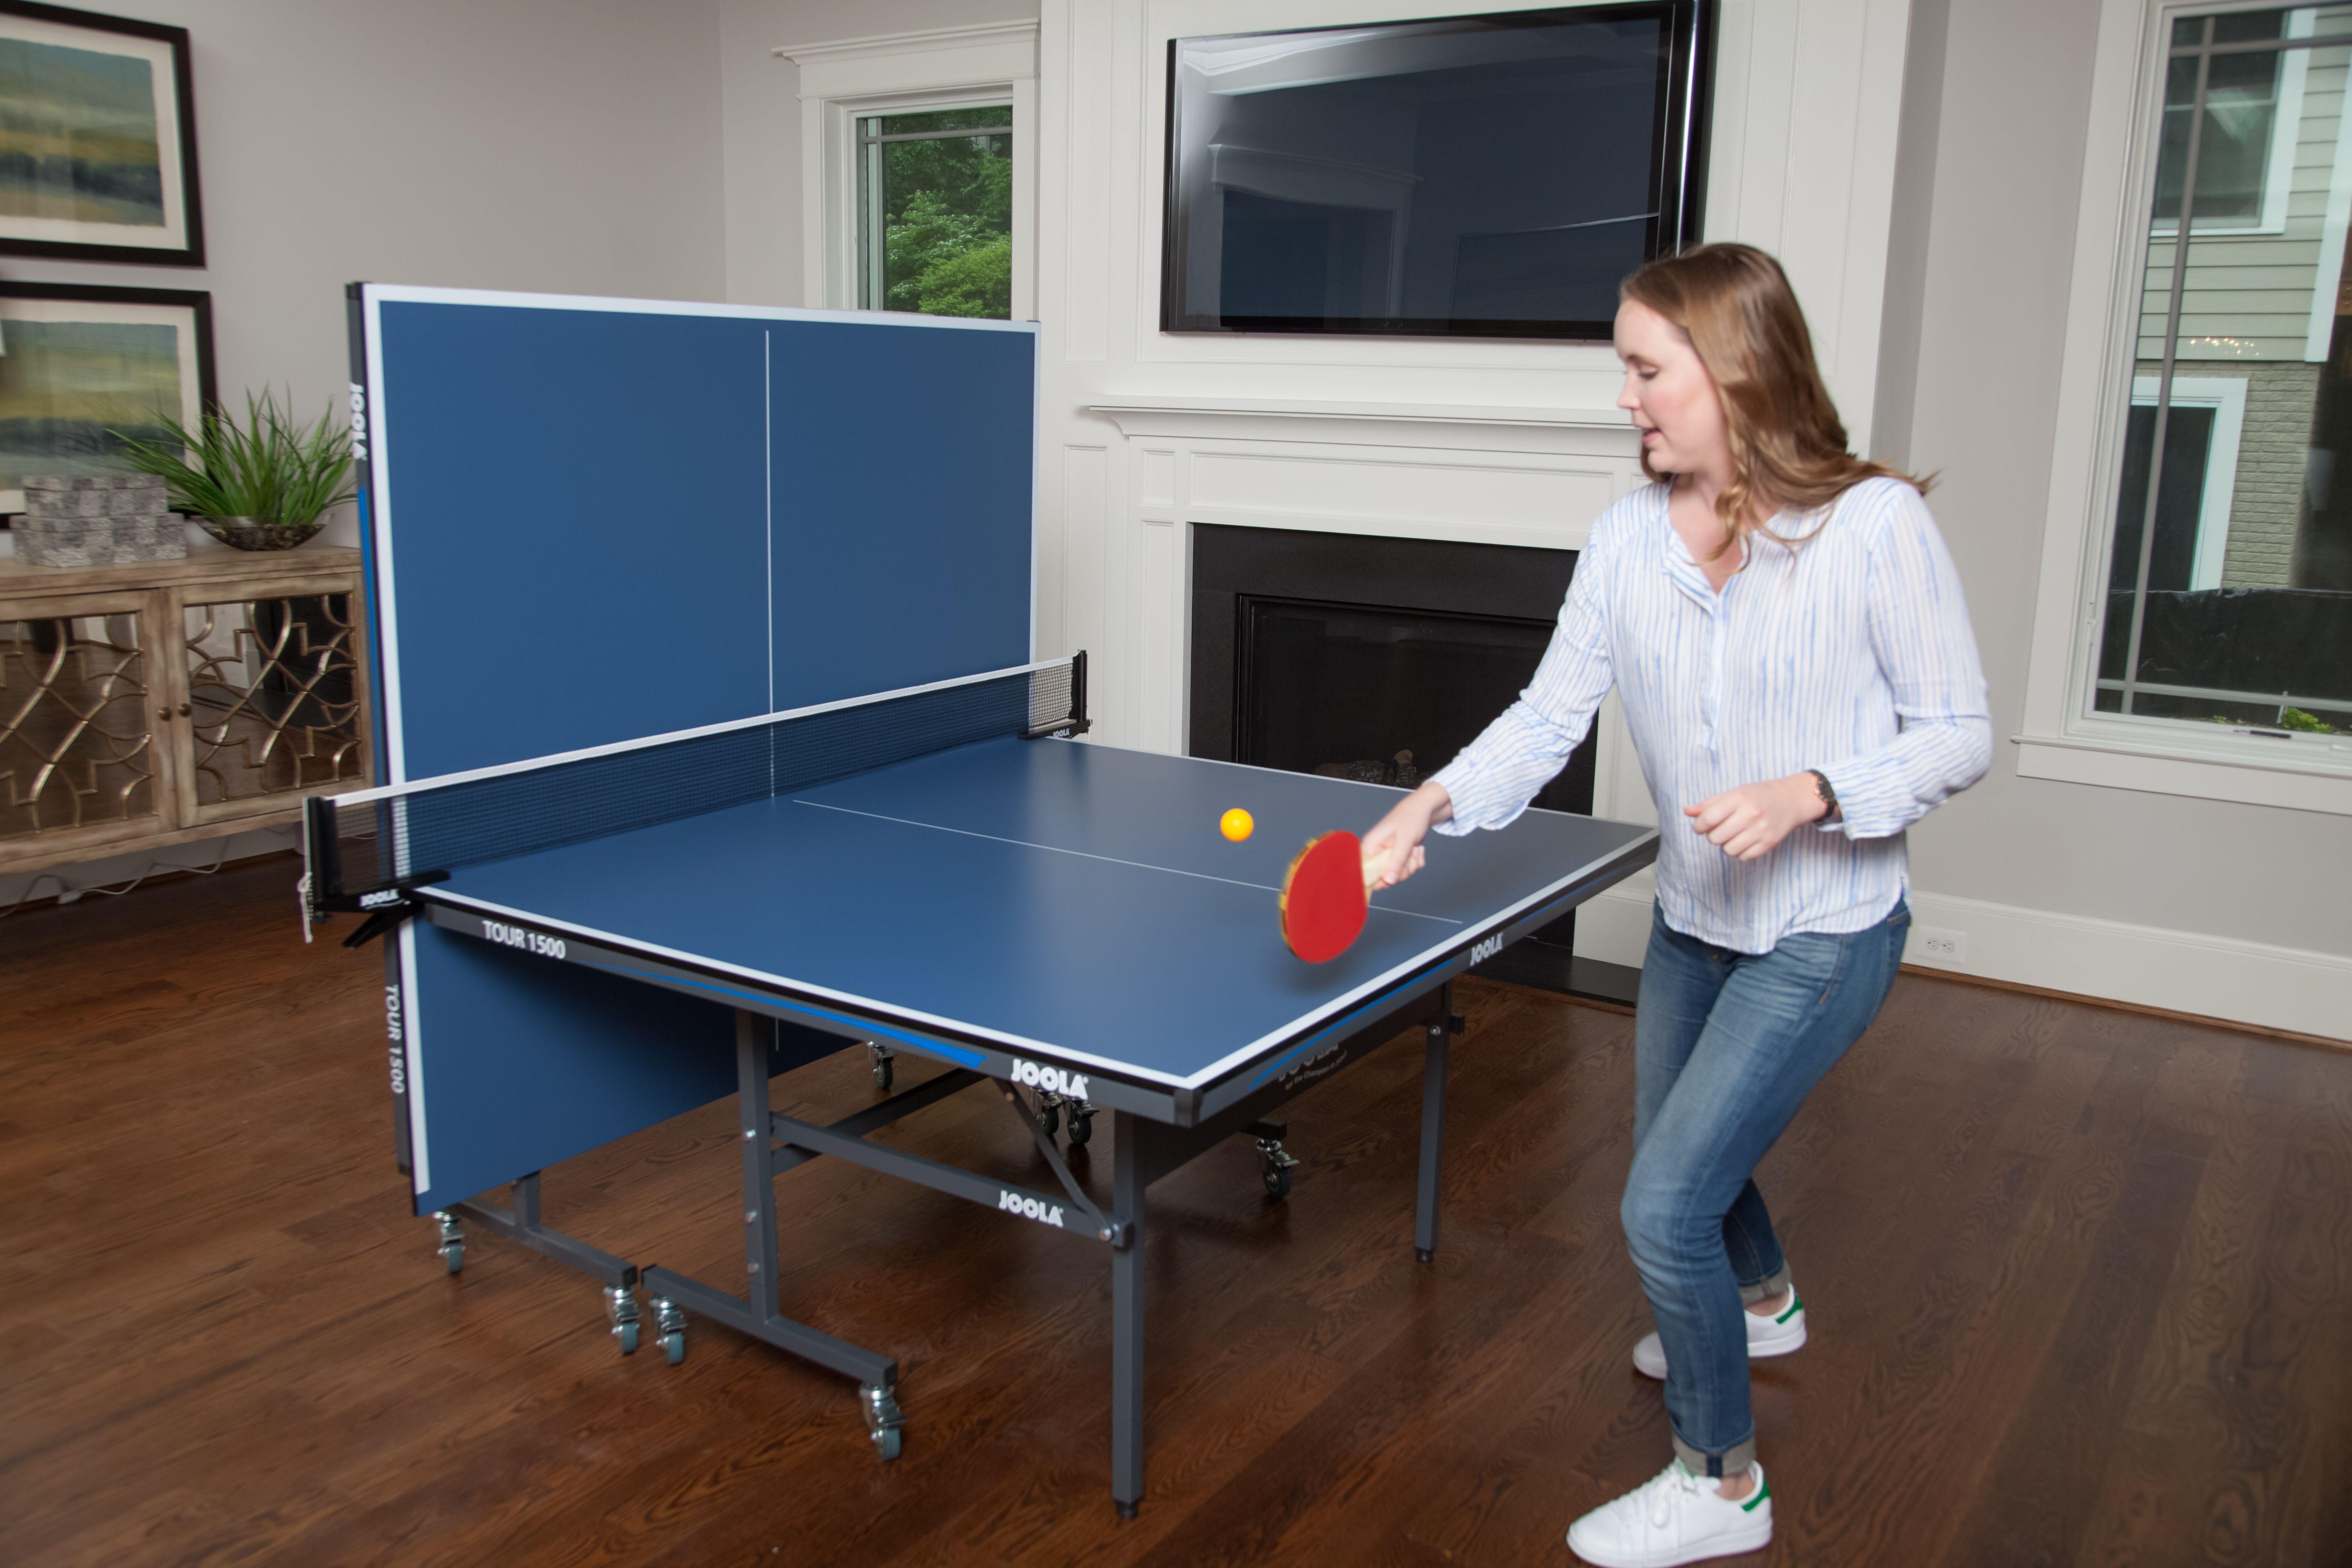 Joola Tour 1500 Table Tennis Table 15mm Joola Table Tennis Affordable Table Indoor